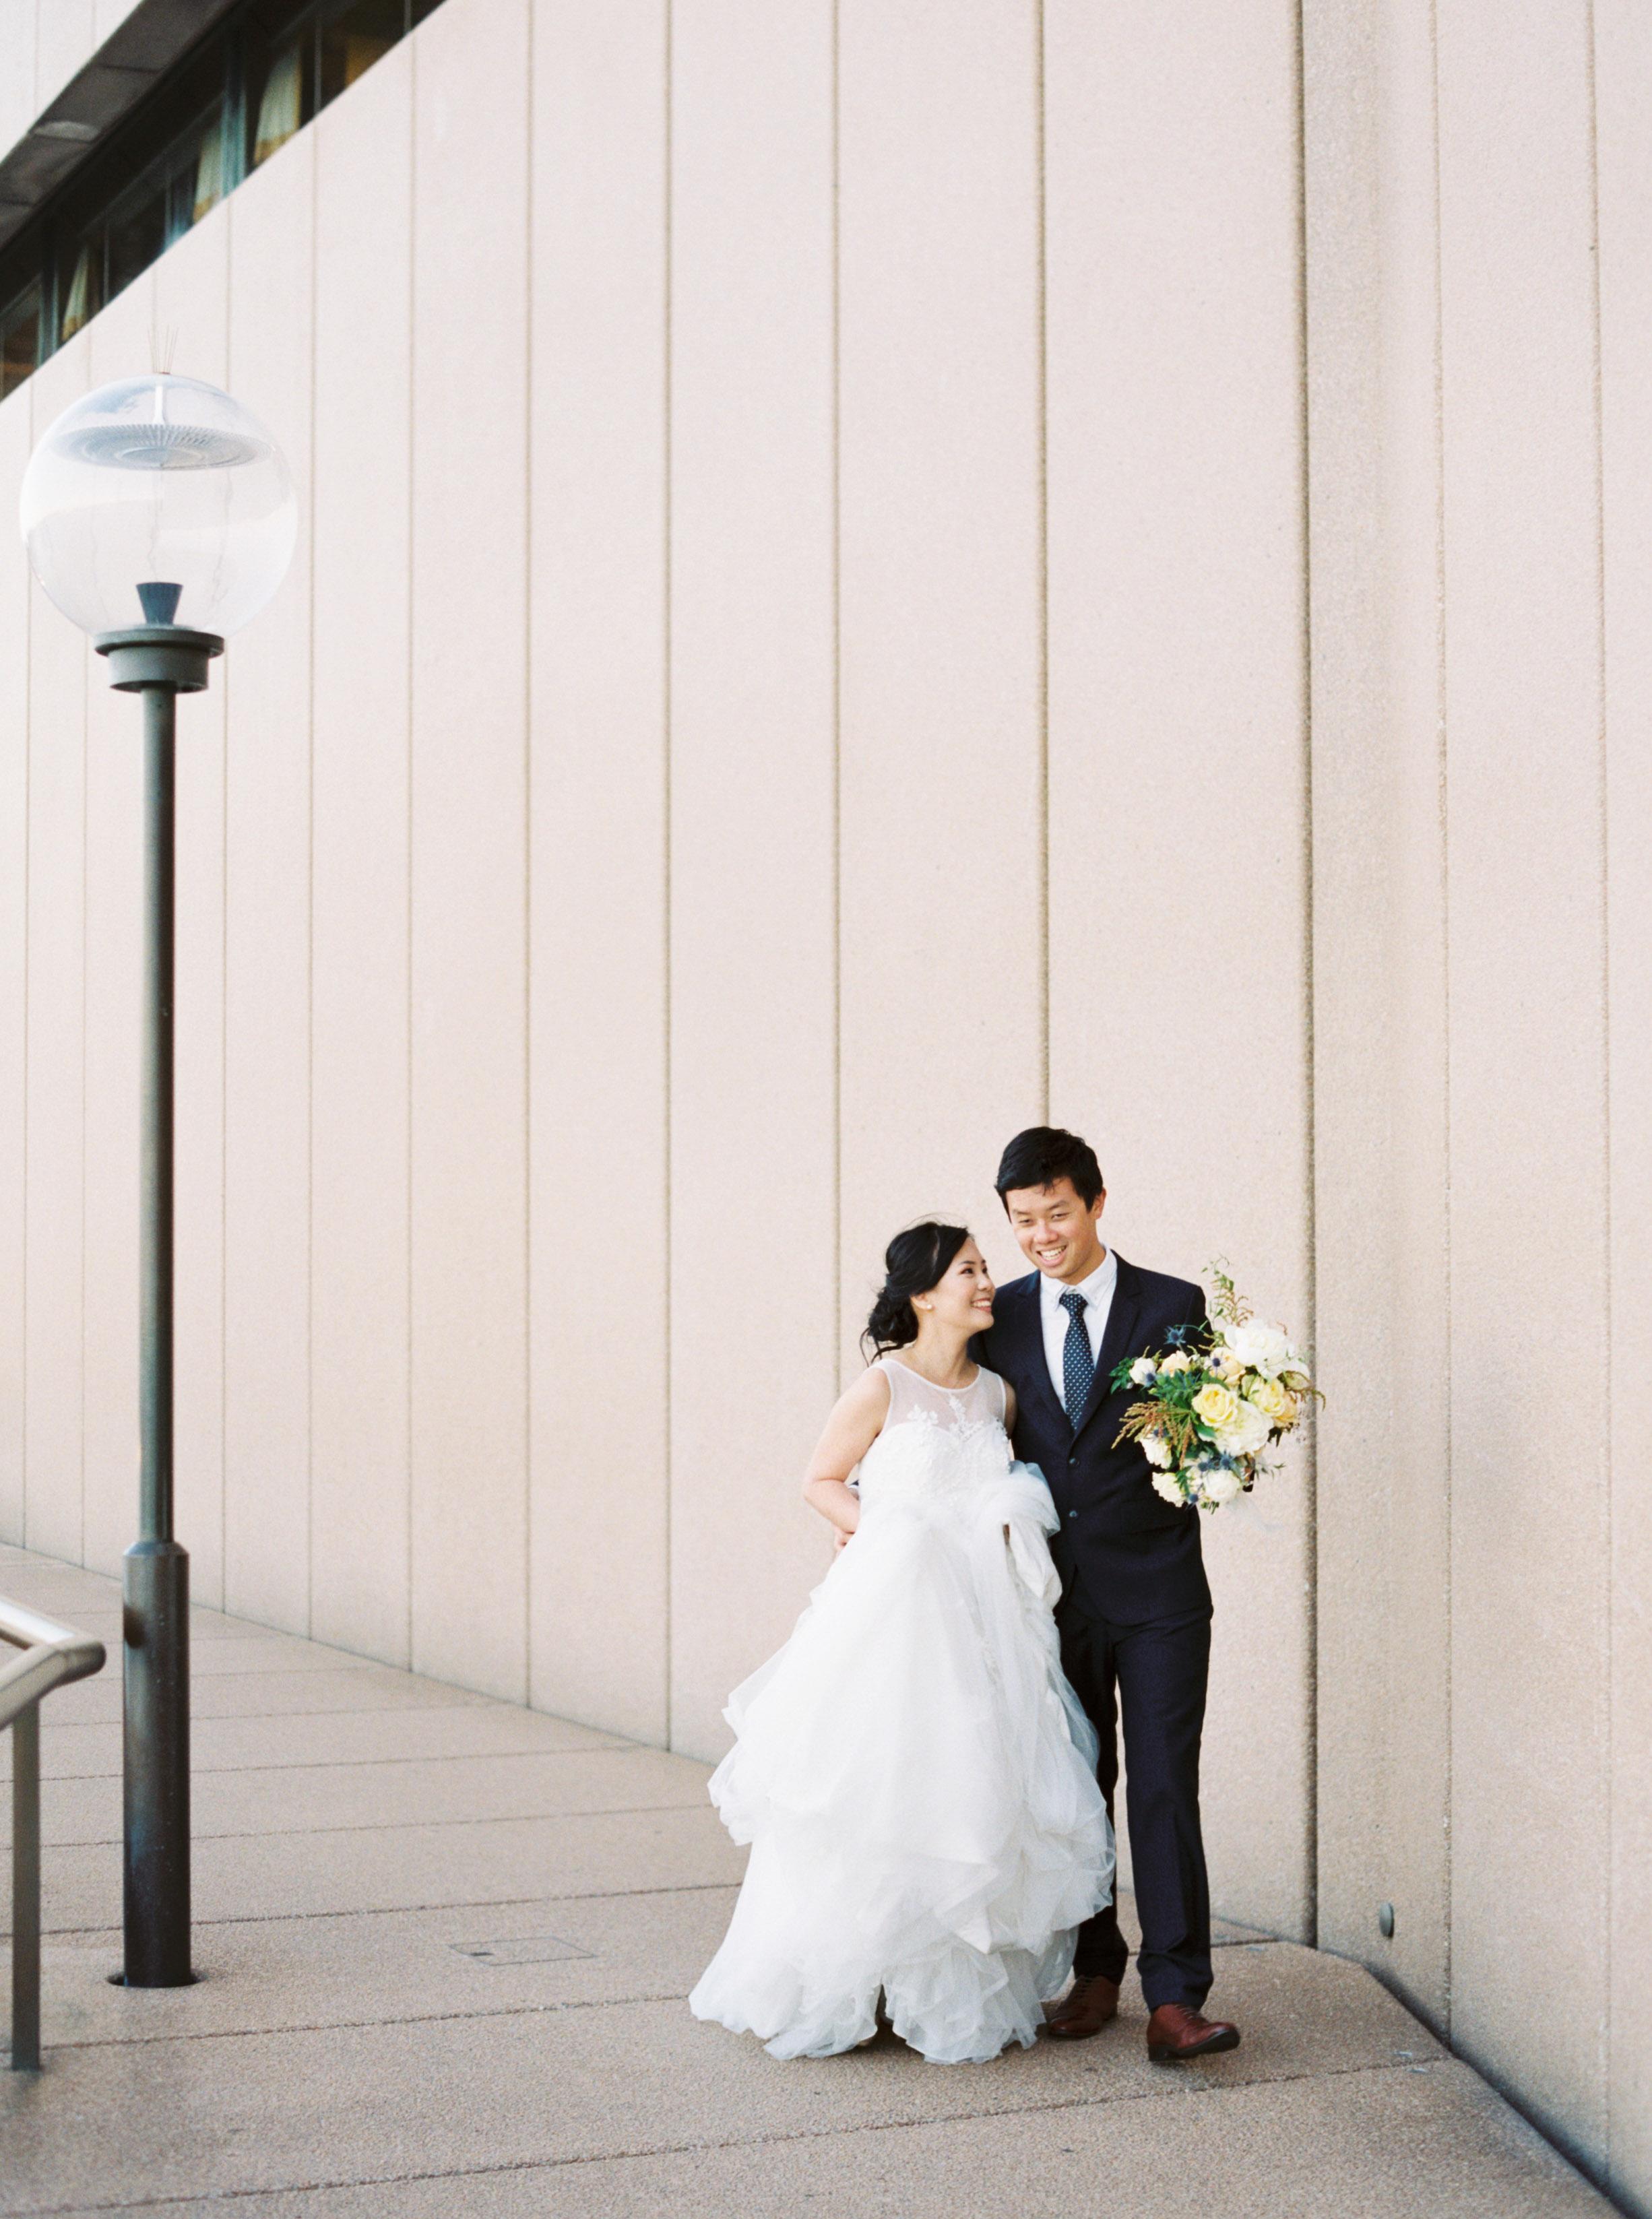 00034- Australia Sydney Wedding Photographer Sheri McMahon.jpg